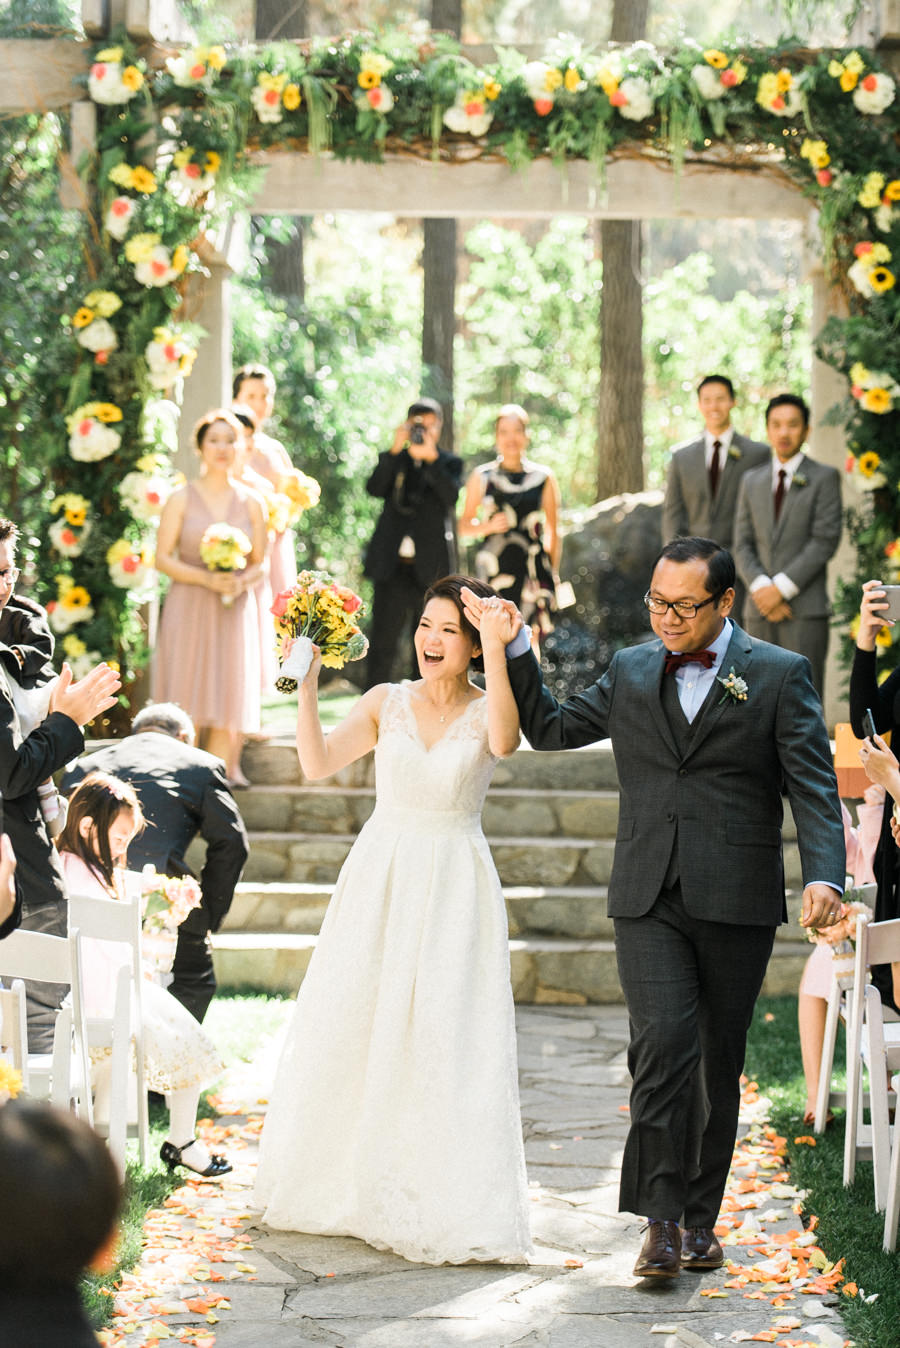 Calamigos Ranch Redwood Room wedding 038.jpg